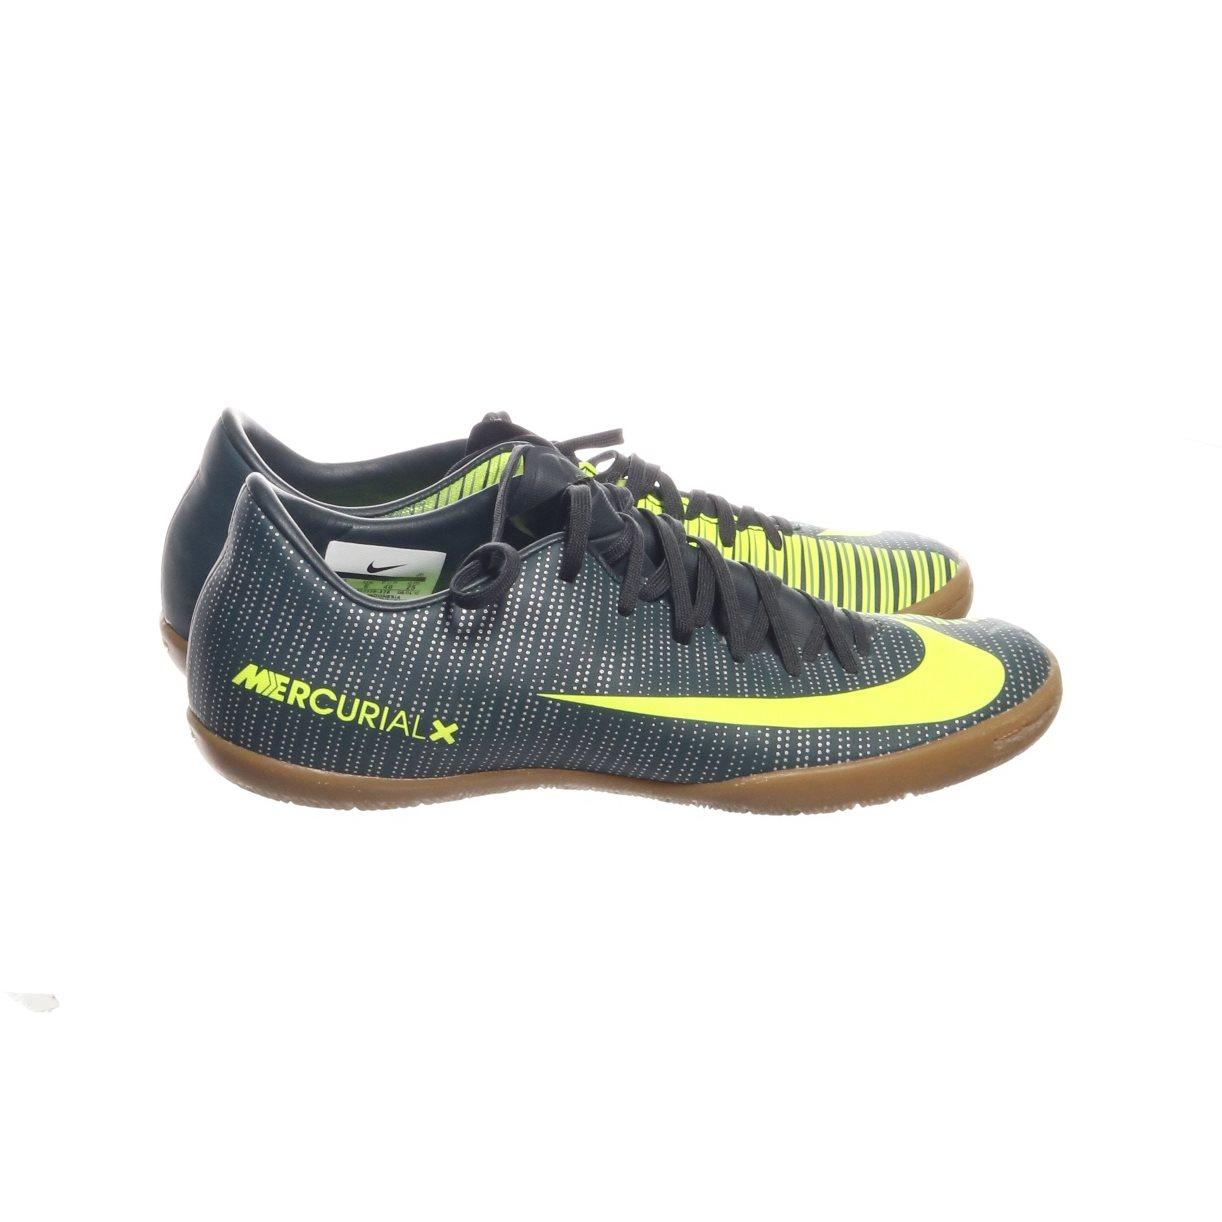 finest selection c605f 9f47a Nike, Träningsskor , Strl  40, Innesko, Mörkblå Gul